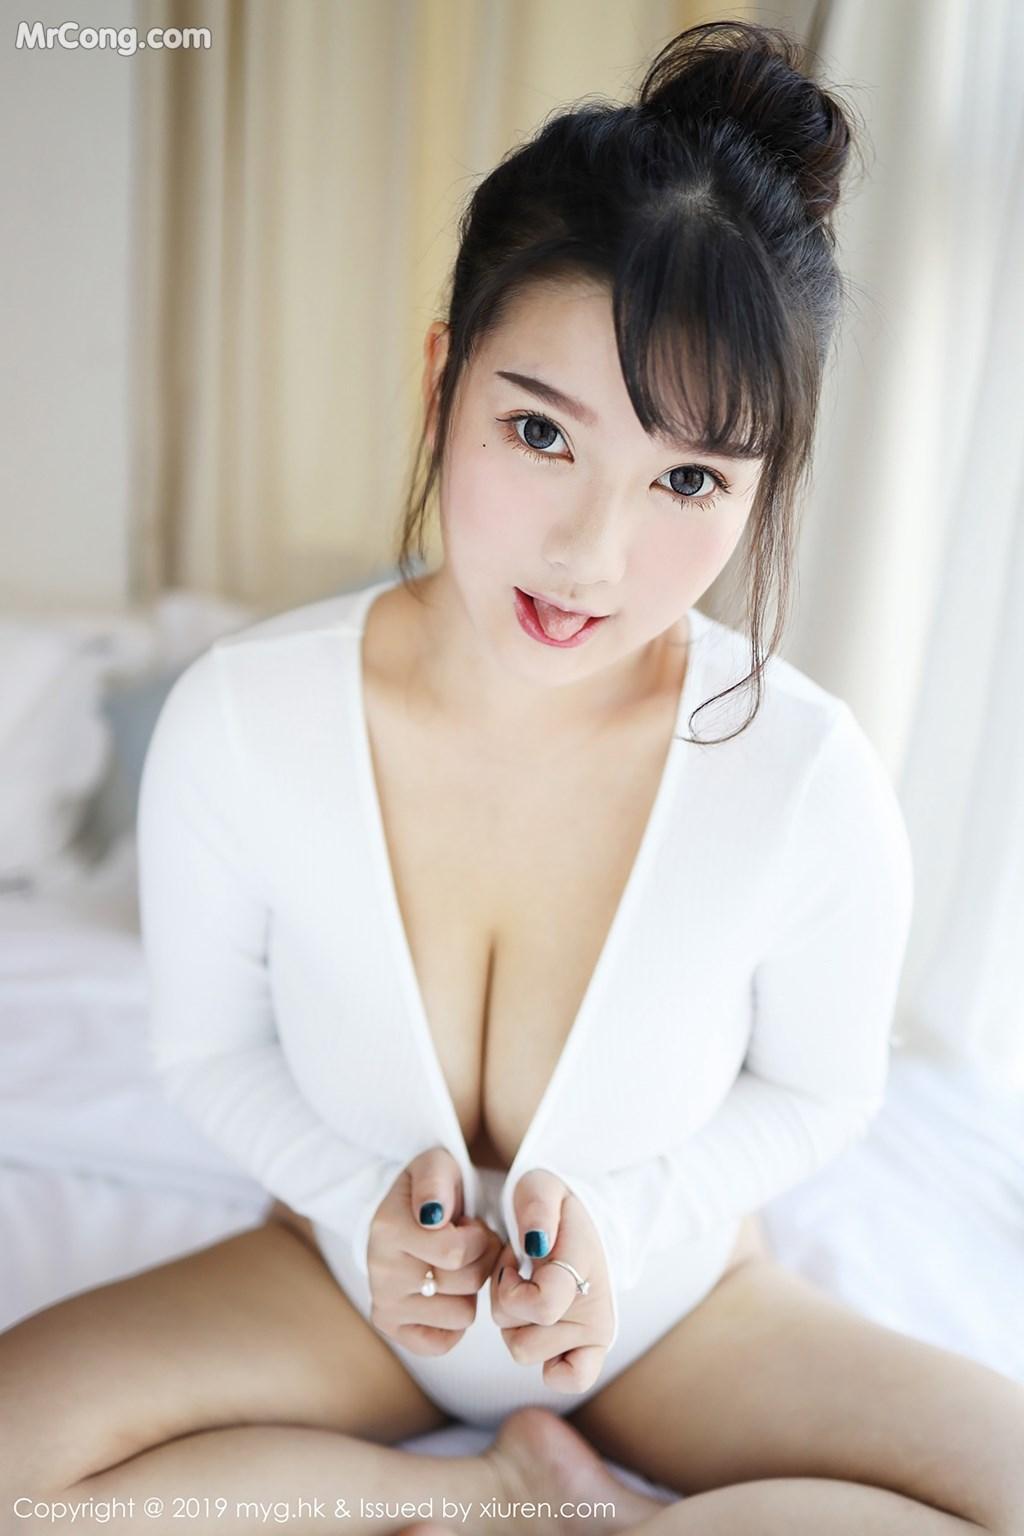 Image MyGirl-Vol.342-Xiao-You-Nai-MrCong.com-011 in post MyGirl Vol.342: Người mẫu Xiao You Nai (小尤奈) (41 ảnh)